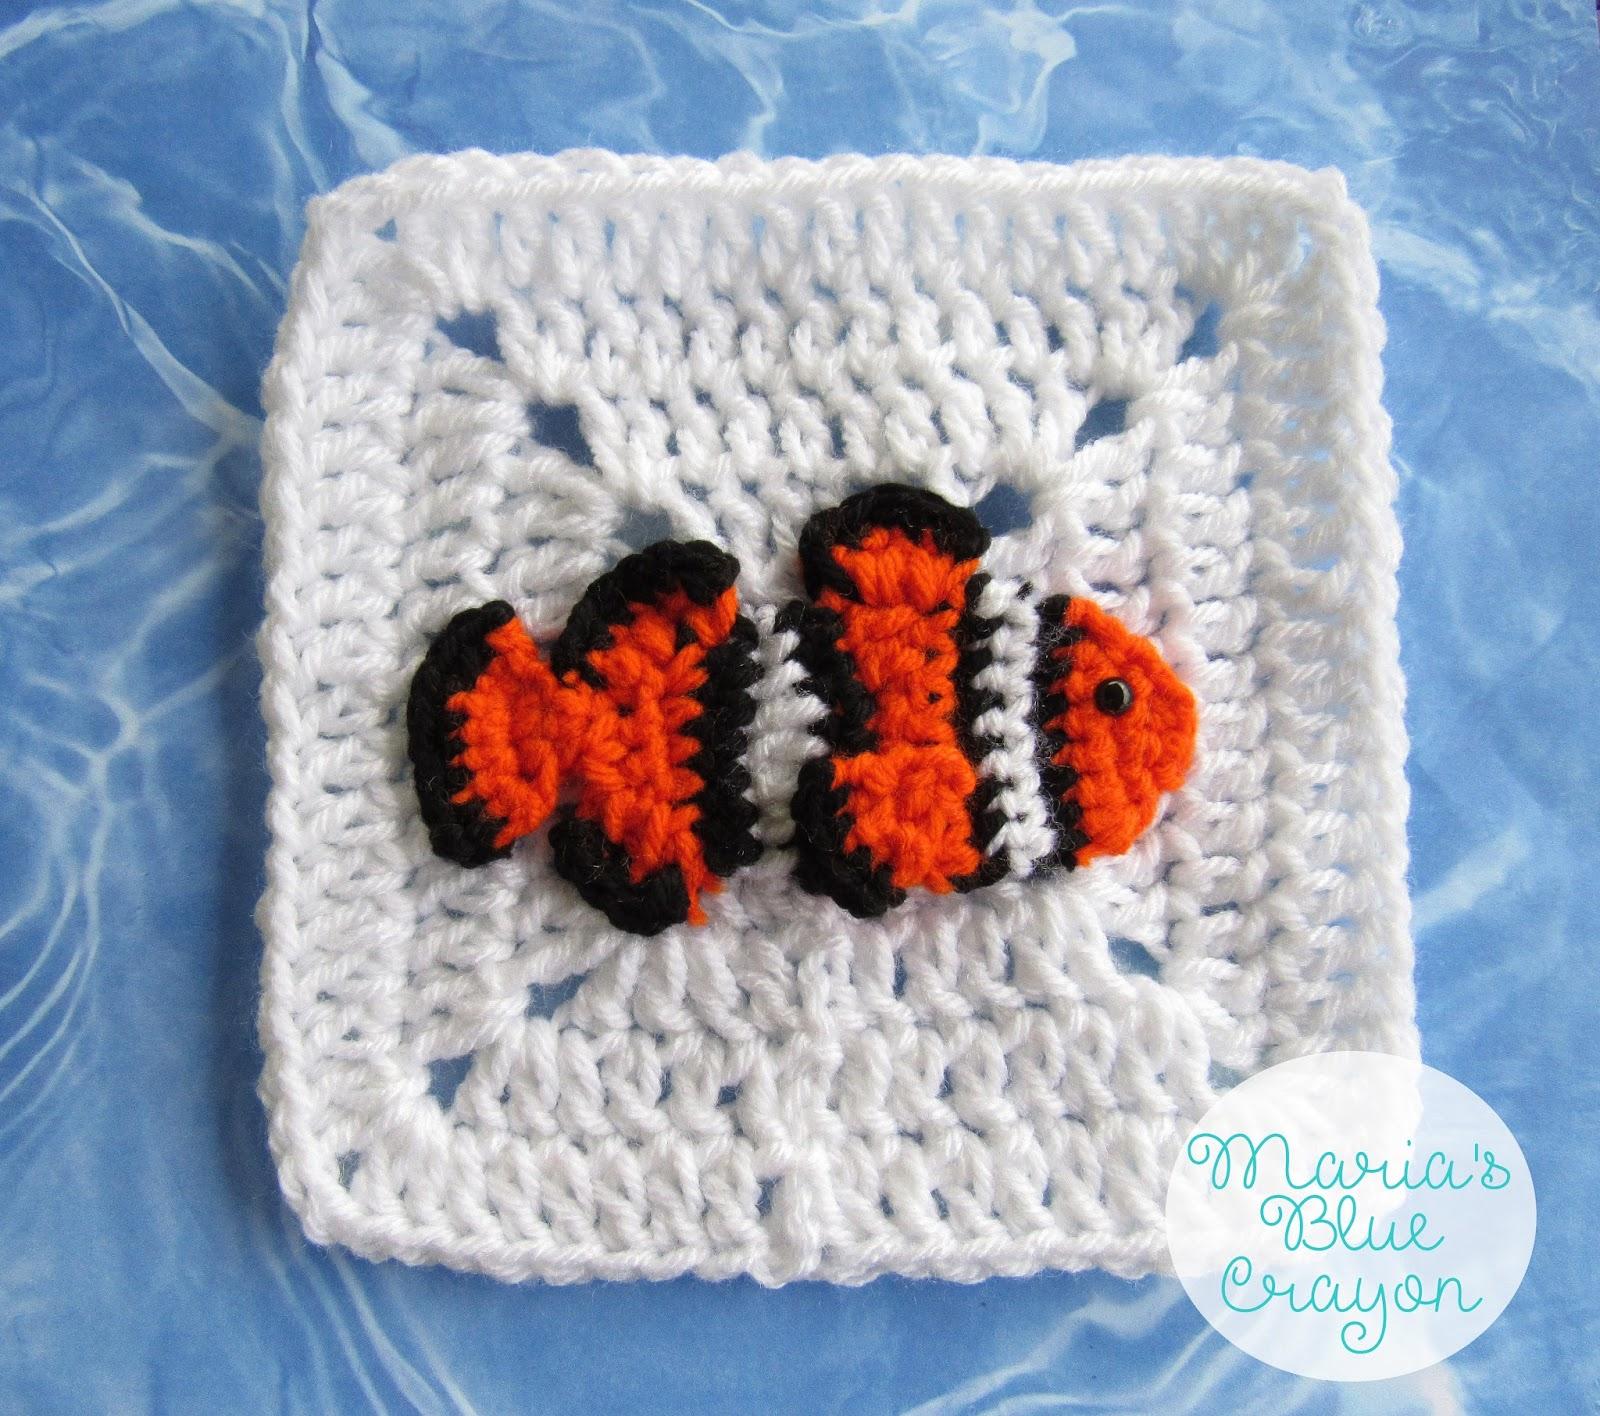 Crochet Clownfish Applique and Granny Square Free Crochet Pattern ...